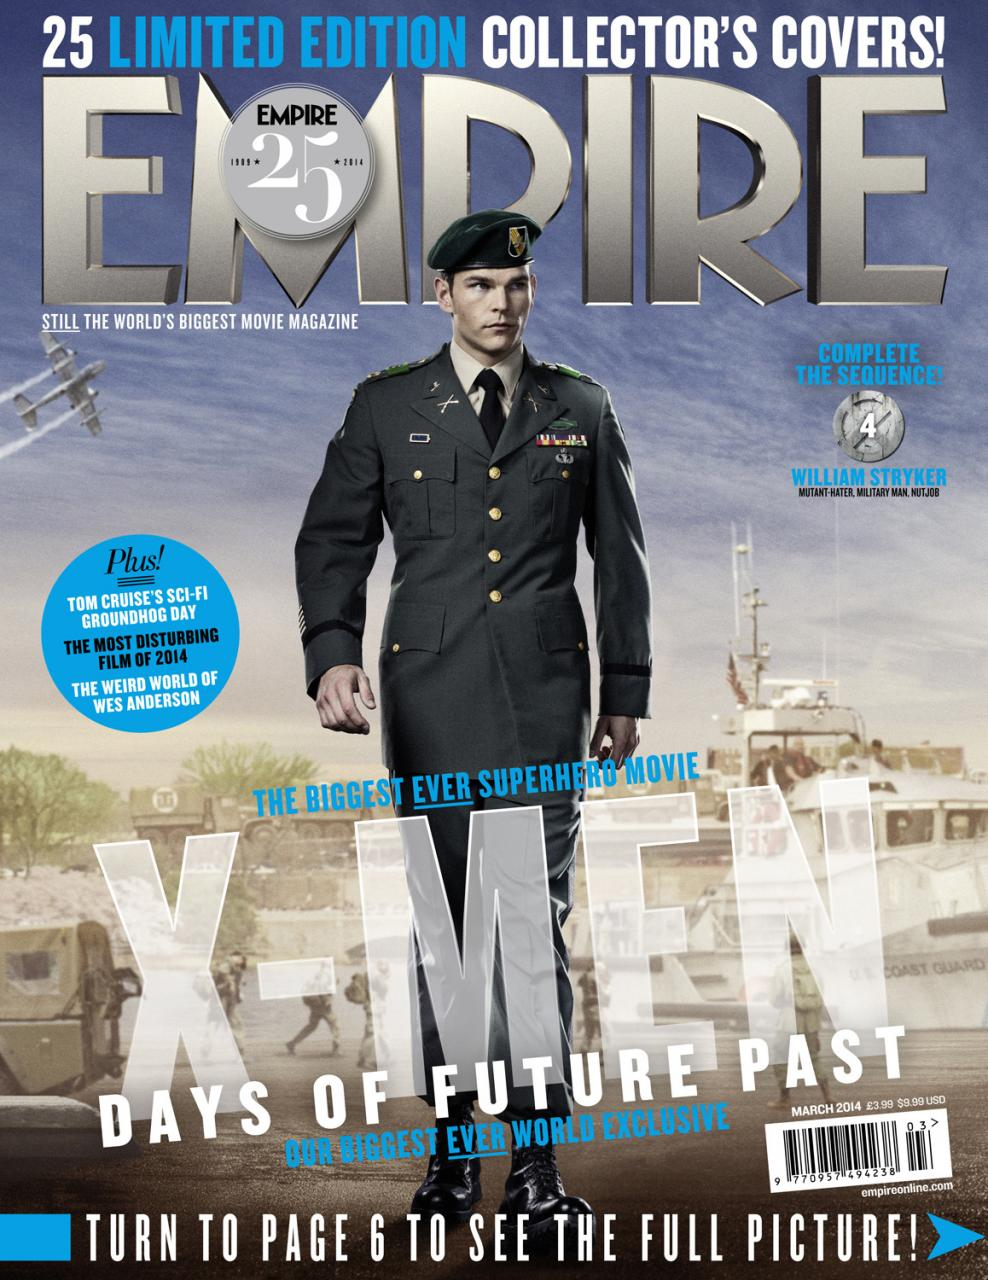 X-MEN DAYS OF FUTURE PAST Empire Magazine Covers  (13)